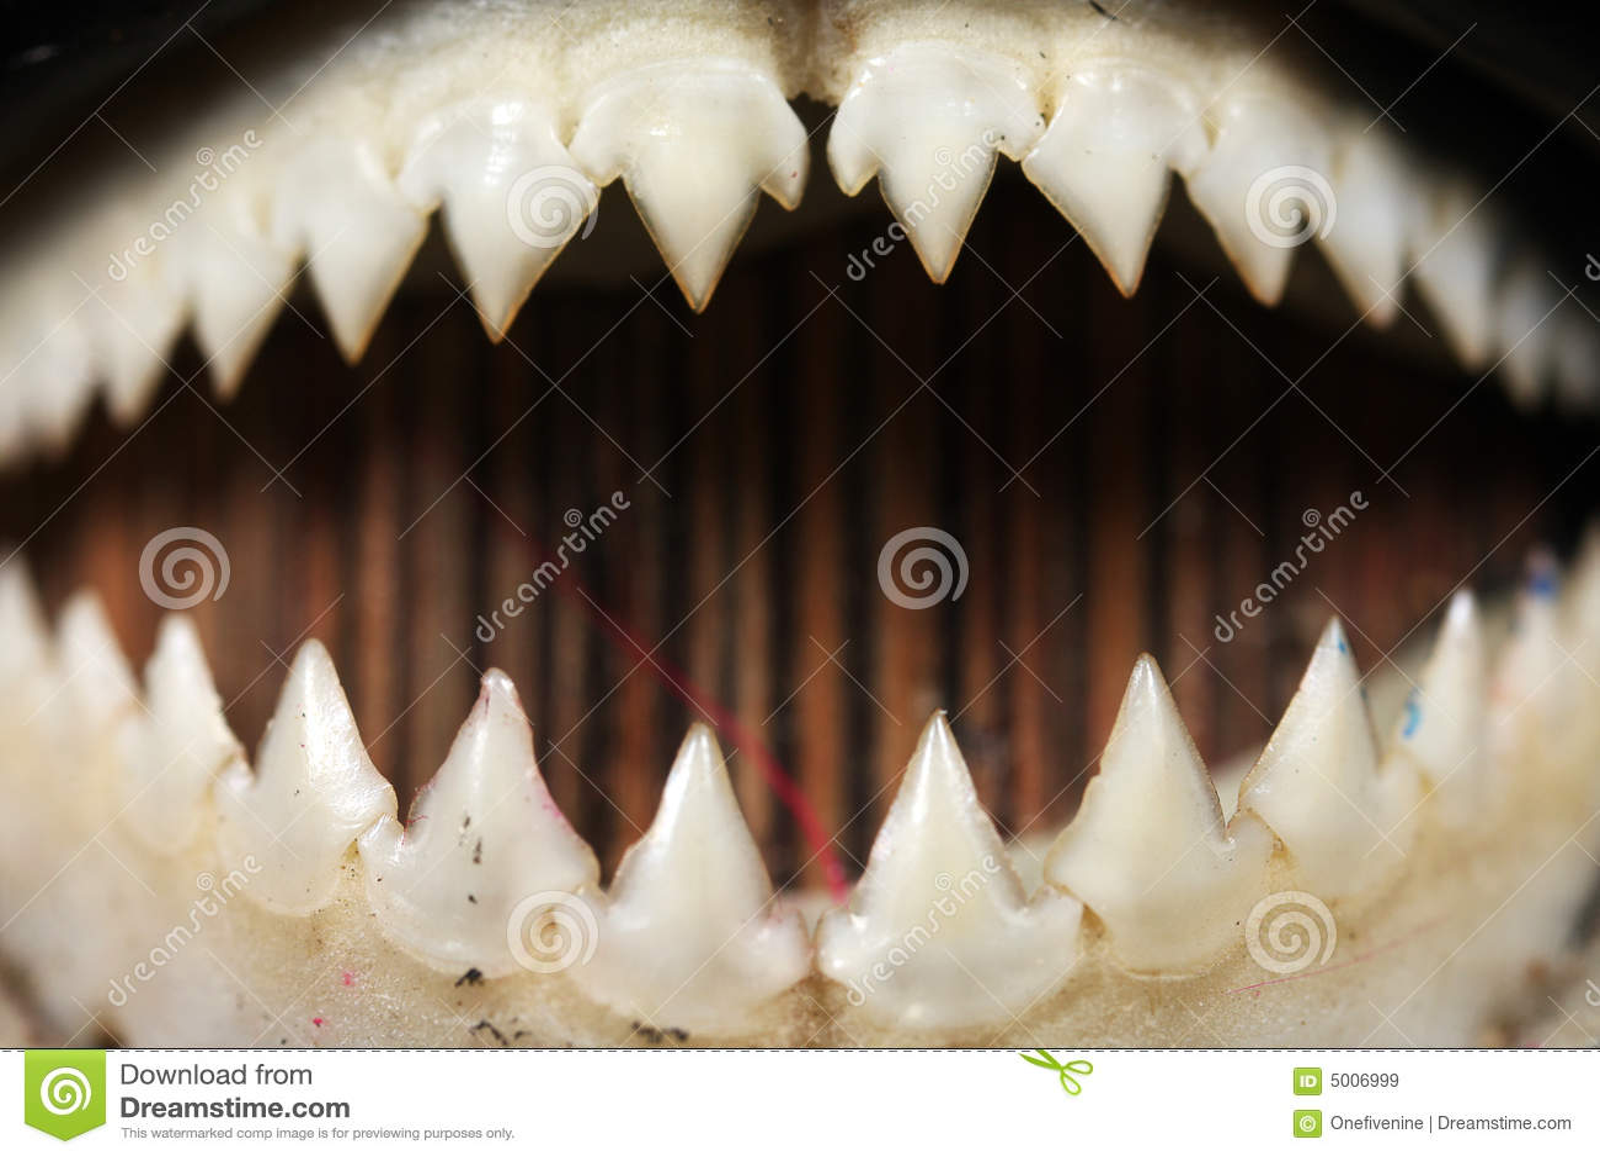 Piranha Teeth Close-up Royalty Free Stock Images